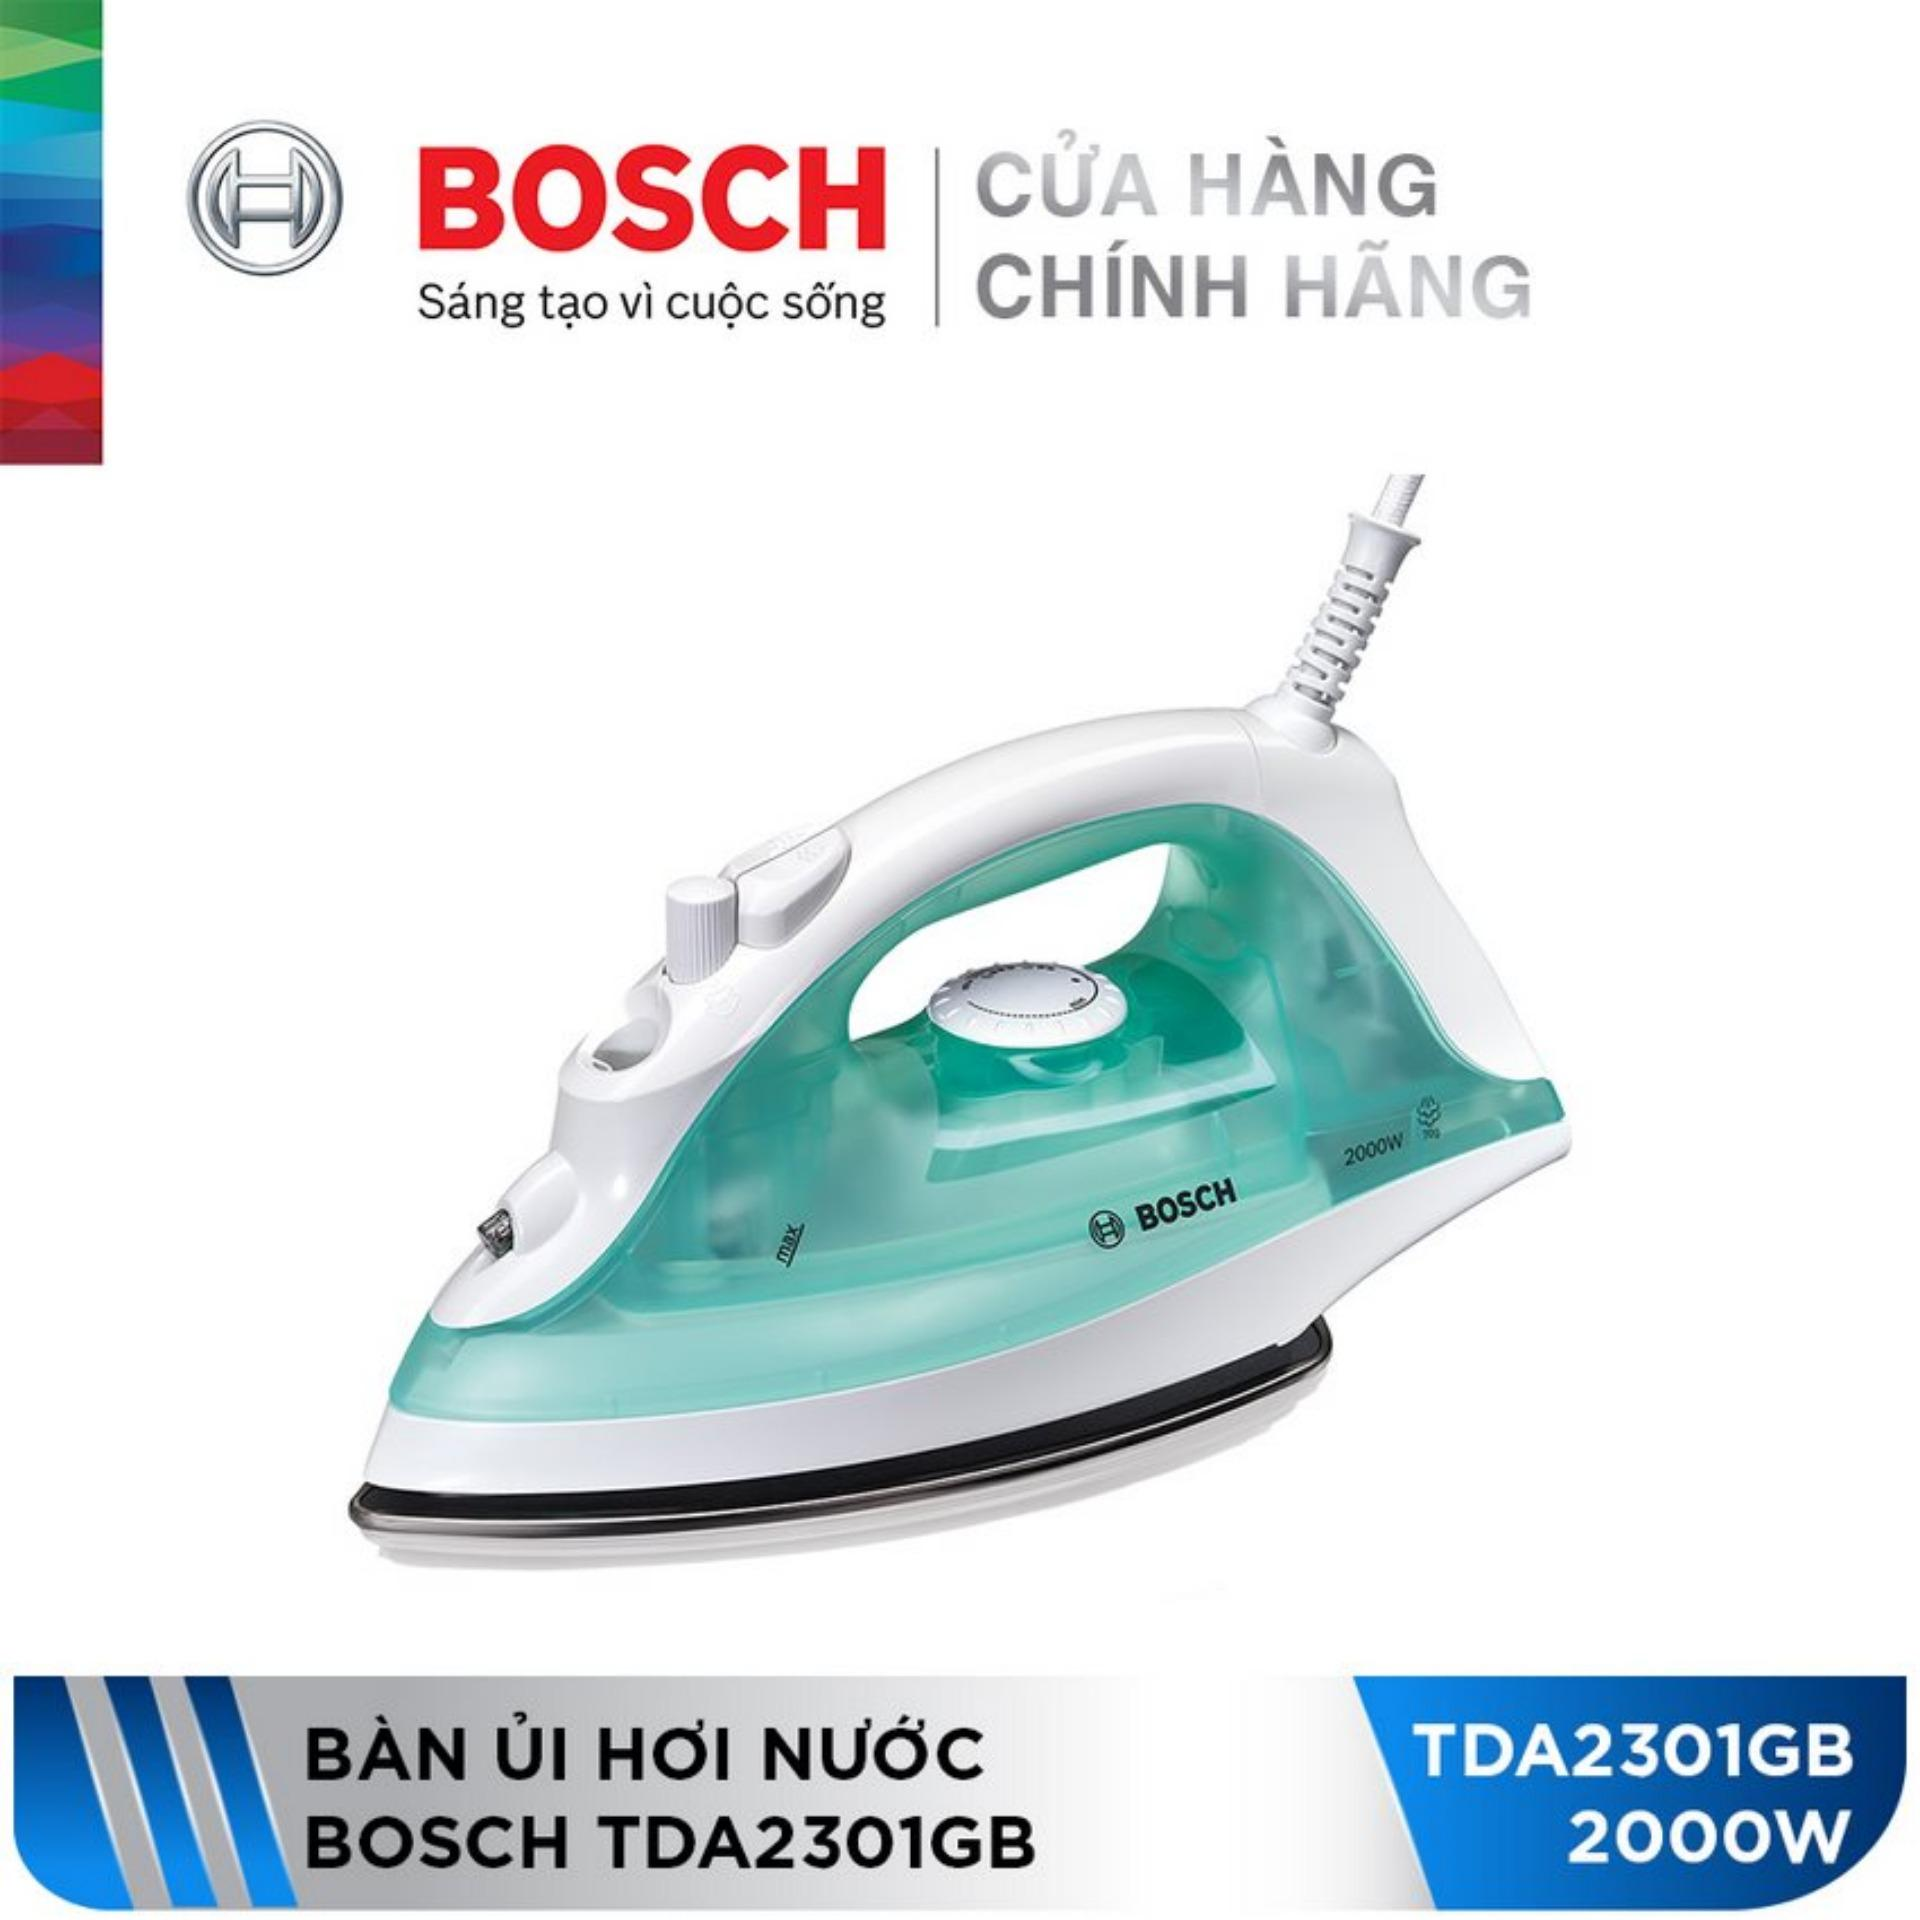 Bàn ủi hơi nước Bosch TDA2301GB (2000W)